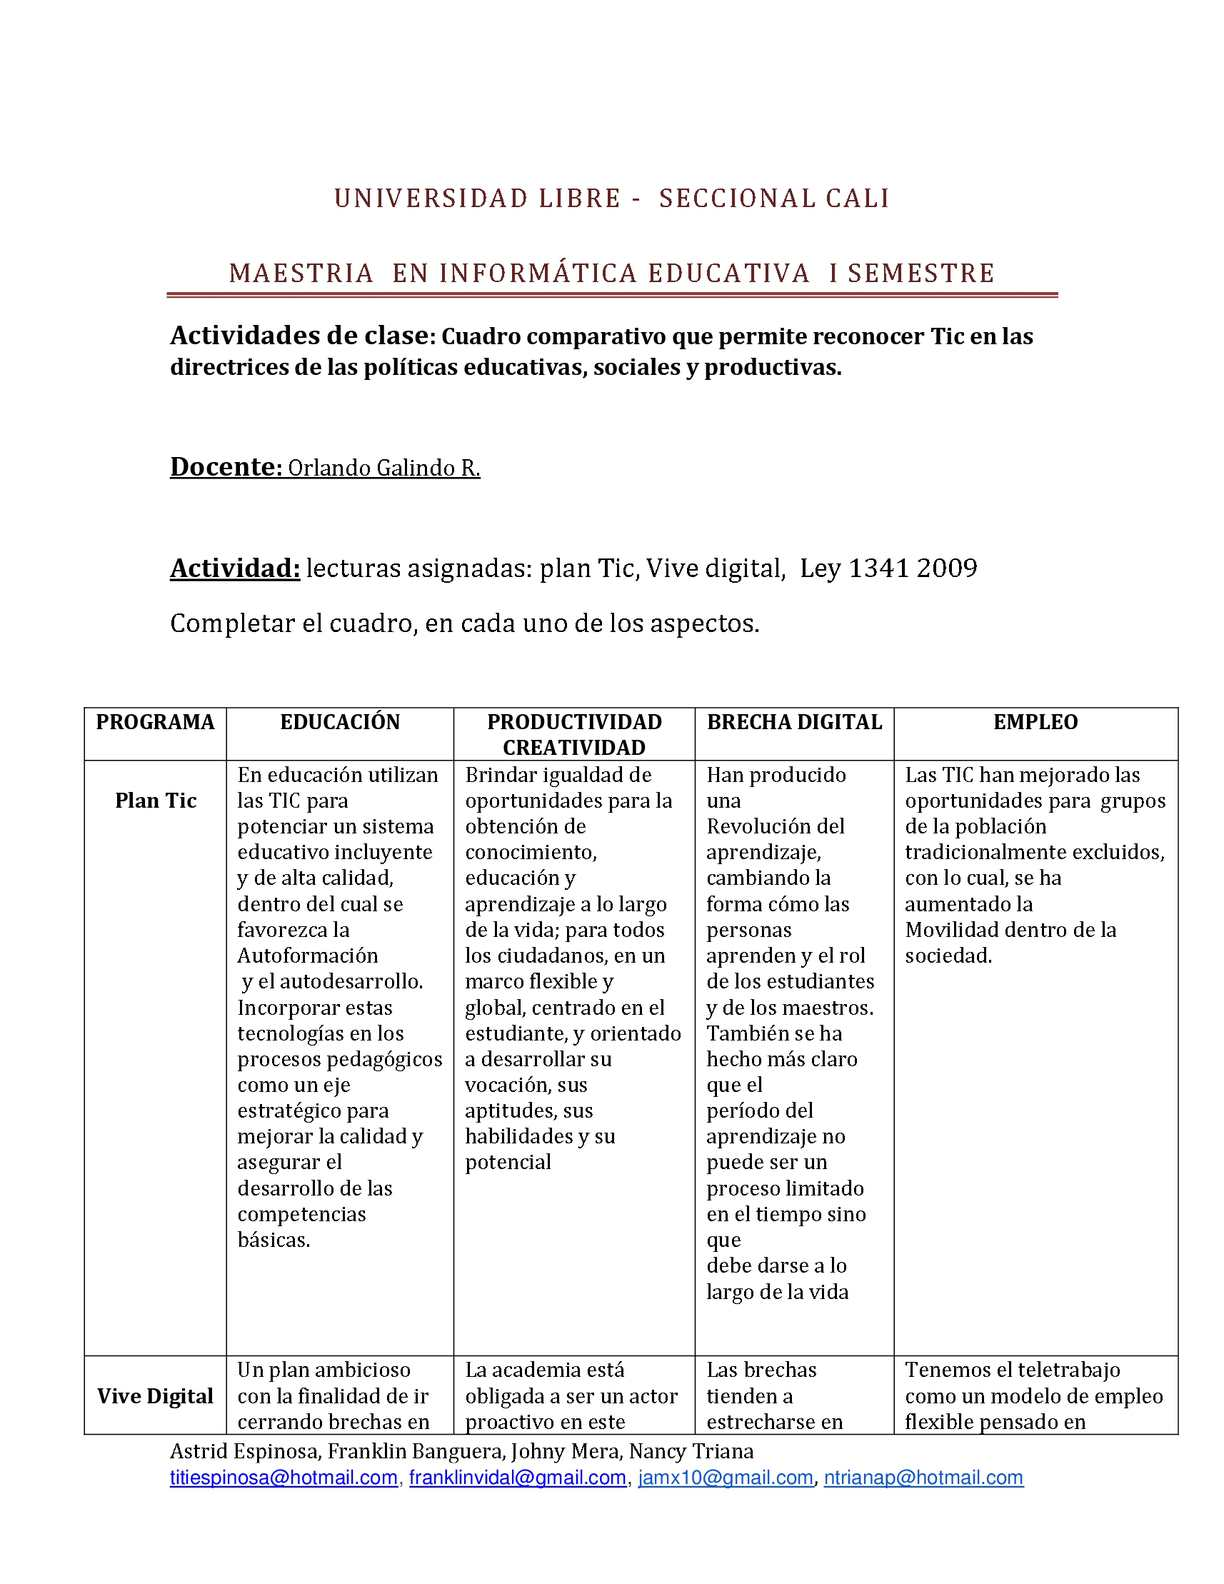 Calaméo - plan Tic, Vive digital, Ley 1341 2009